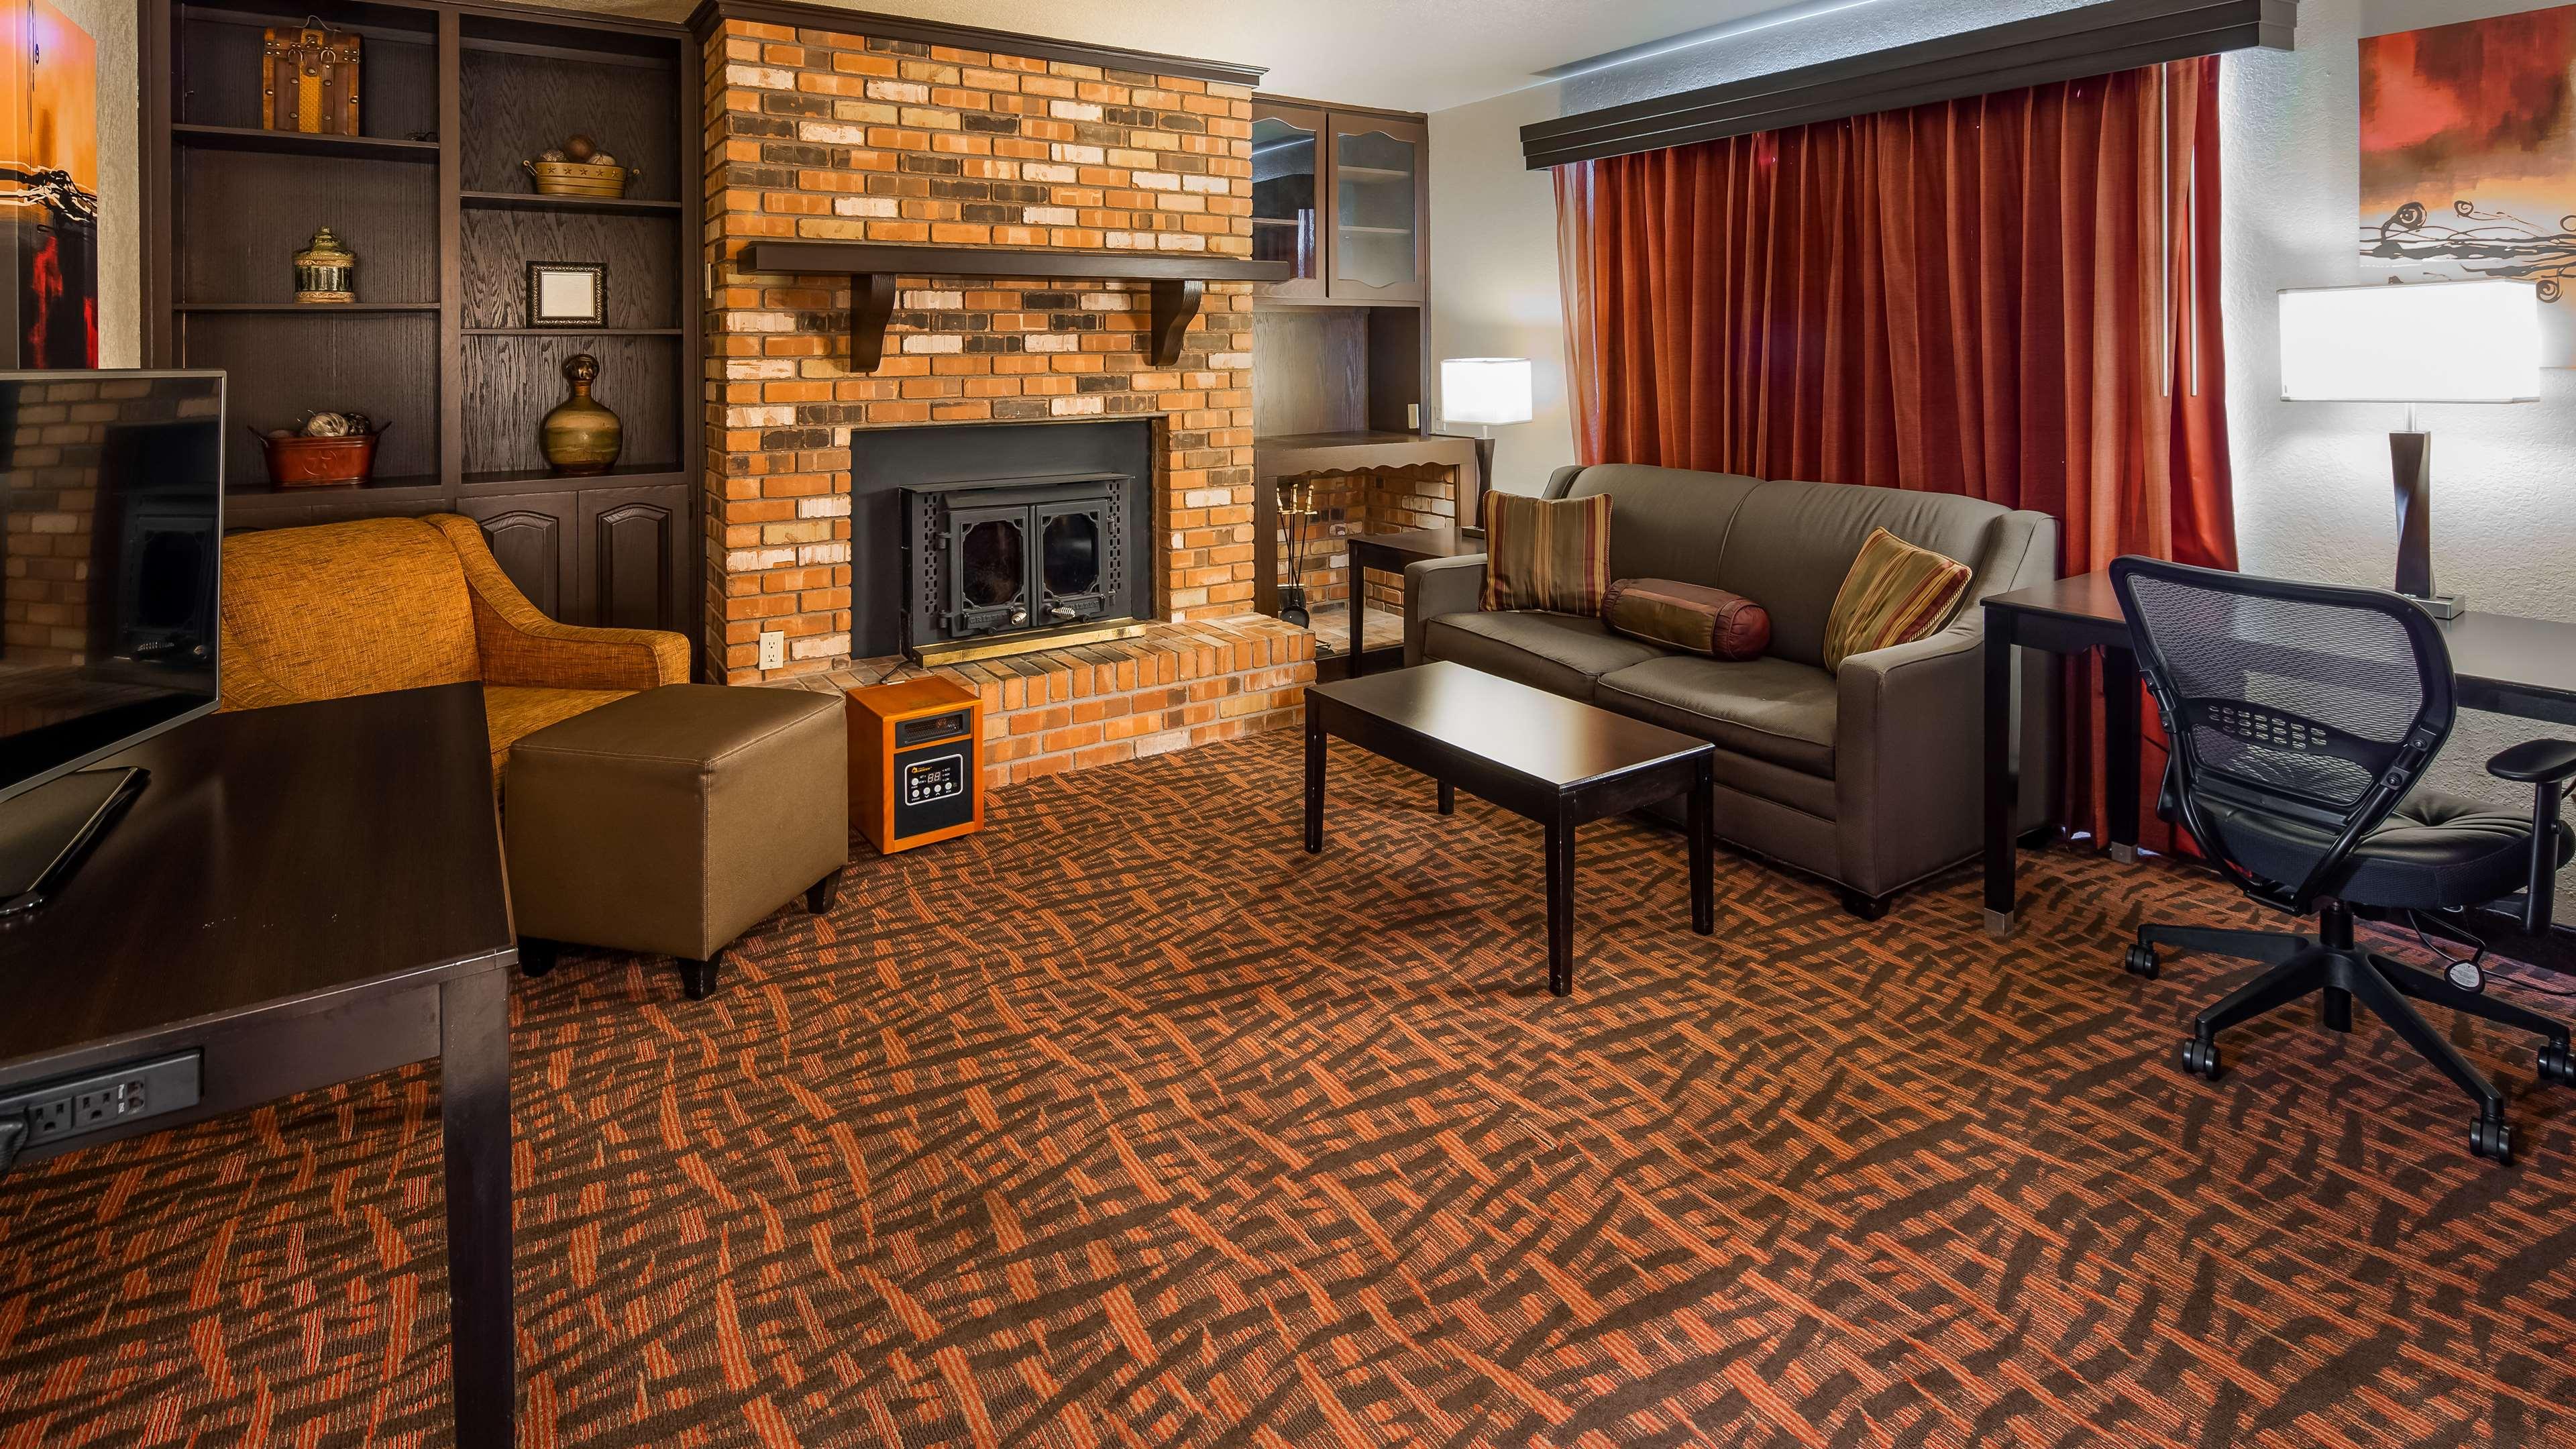 Best Western Arizonian Inn image 12